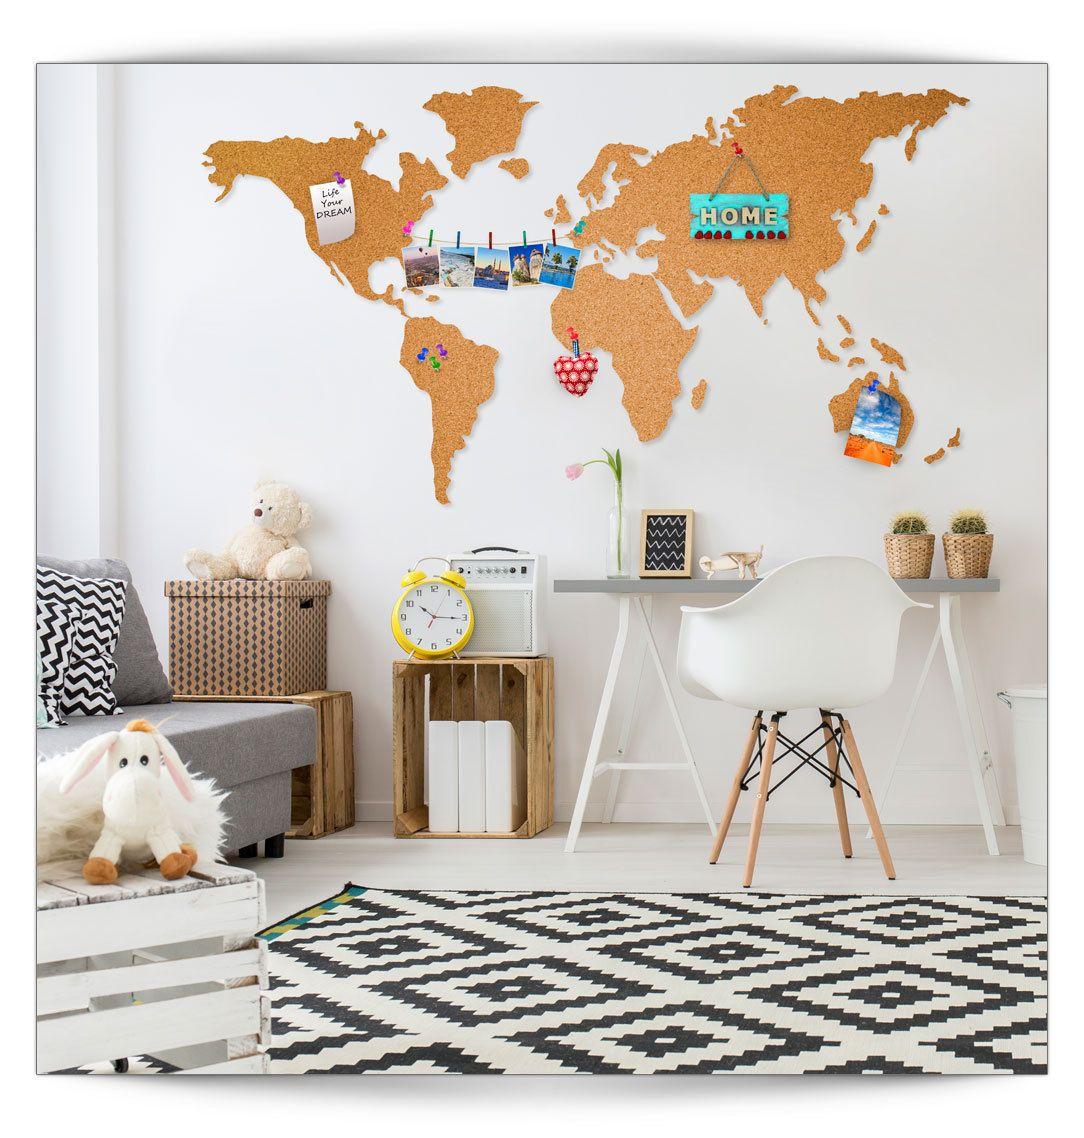 details zu pinnwand weltkarte korktafel 100 natur kork selbstklebend wandbilder xxl format. Black Bedroom Furniture Sets. Home Design Ideas